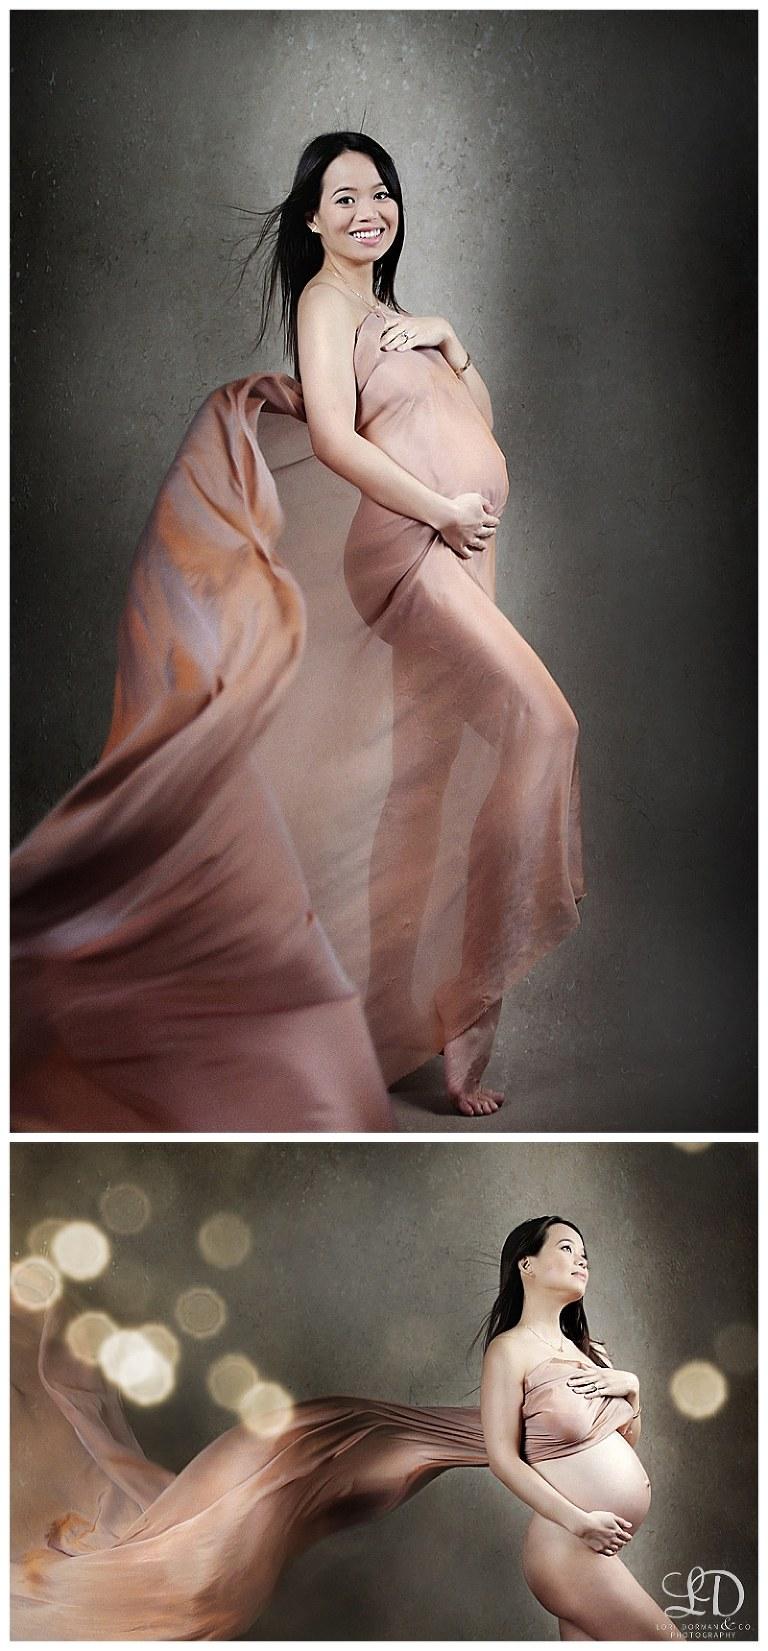 sweet maternity photoshoot-lori dorman photography-maternity boudoir-professional photographer_5615.jpg